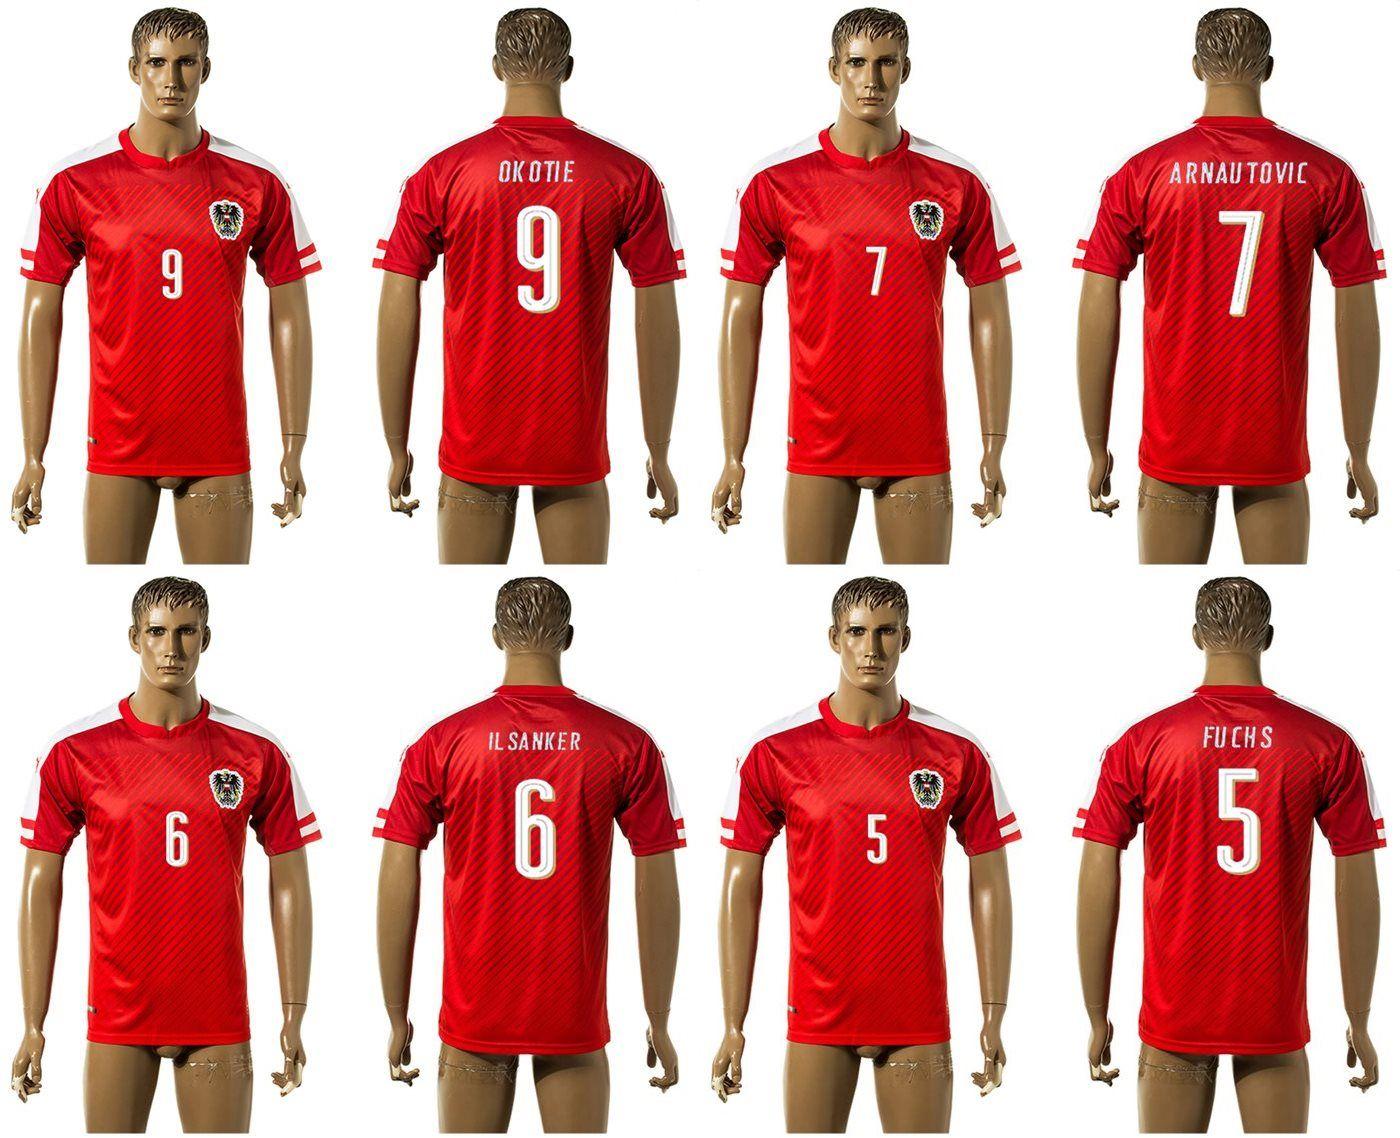 a0daac2e4 Online Cheap 2016 European Cup Austria  5 Fuchs  6 Il Sanker  7 Arnautovic  9  Okotie Soccer Jersey Men S Football Uniform Shirt Custom Name And No.